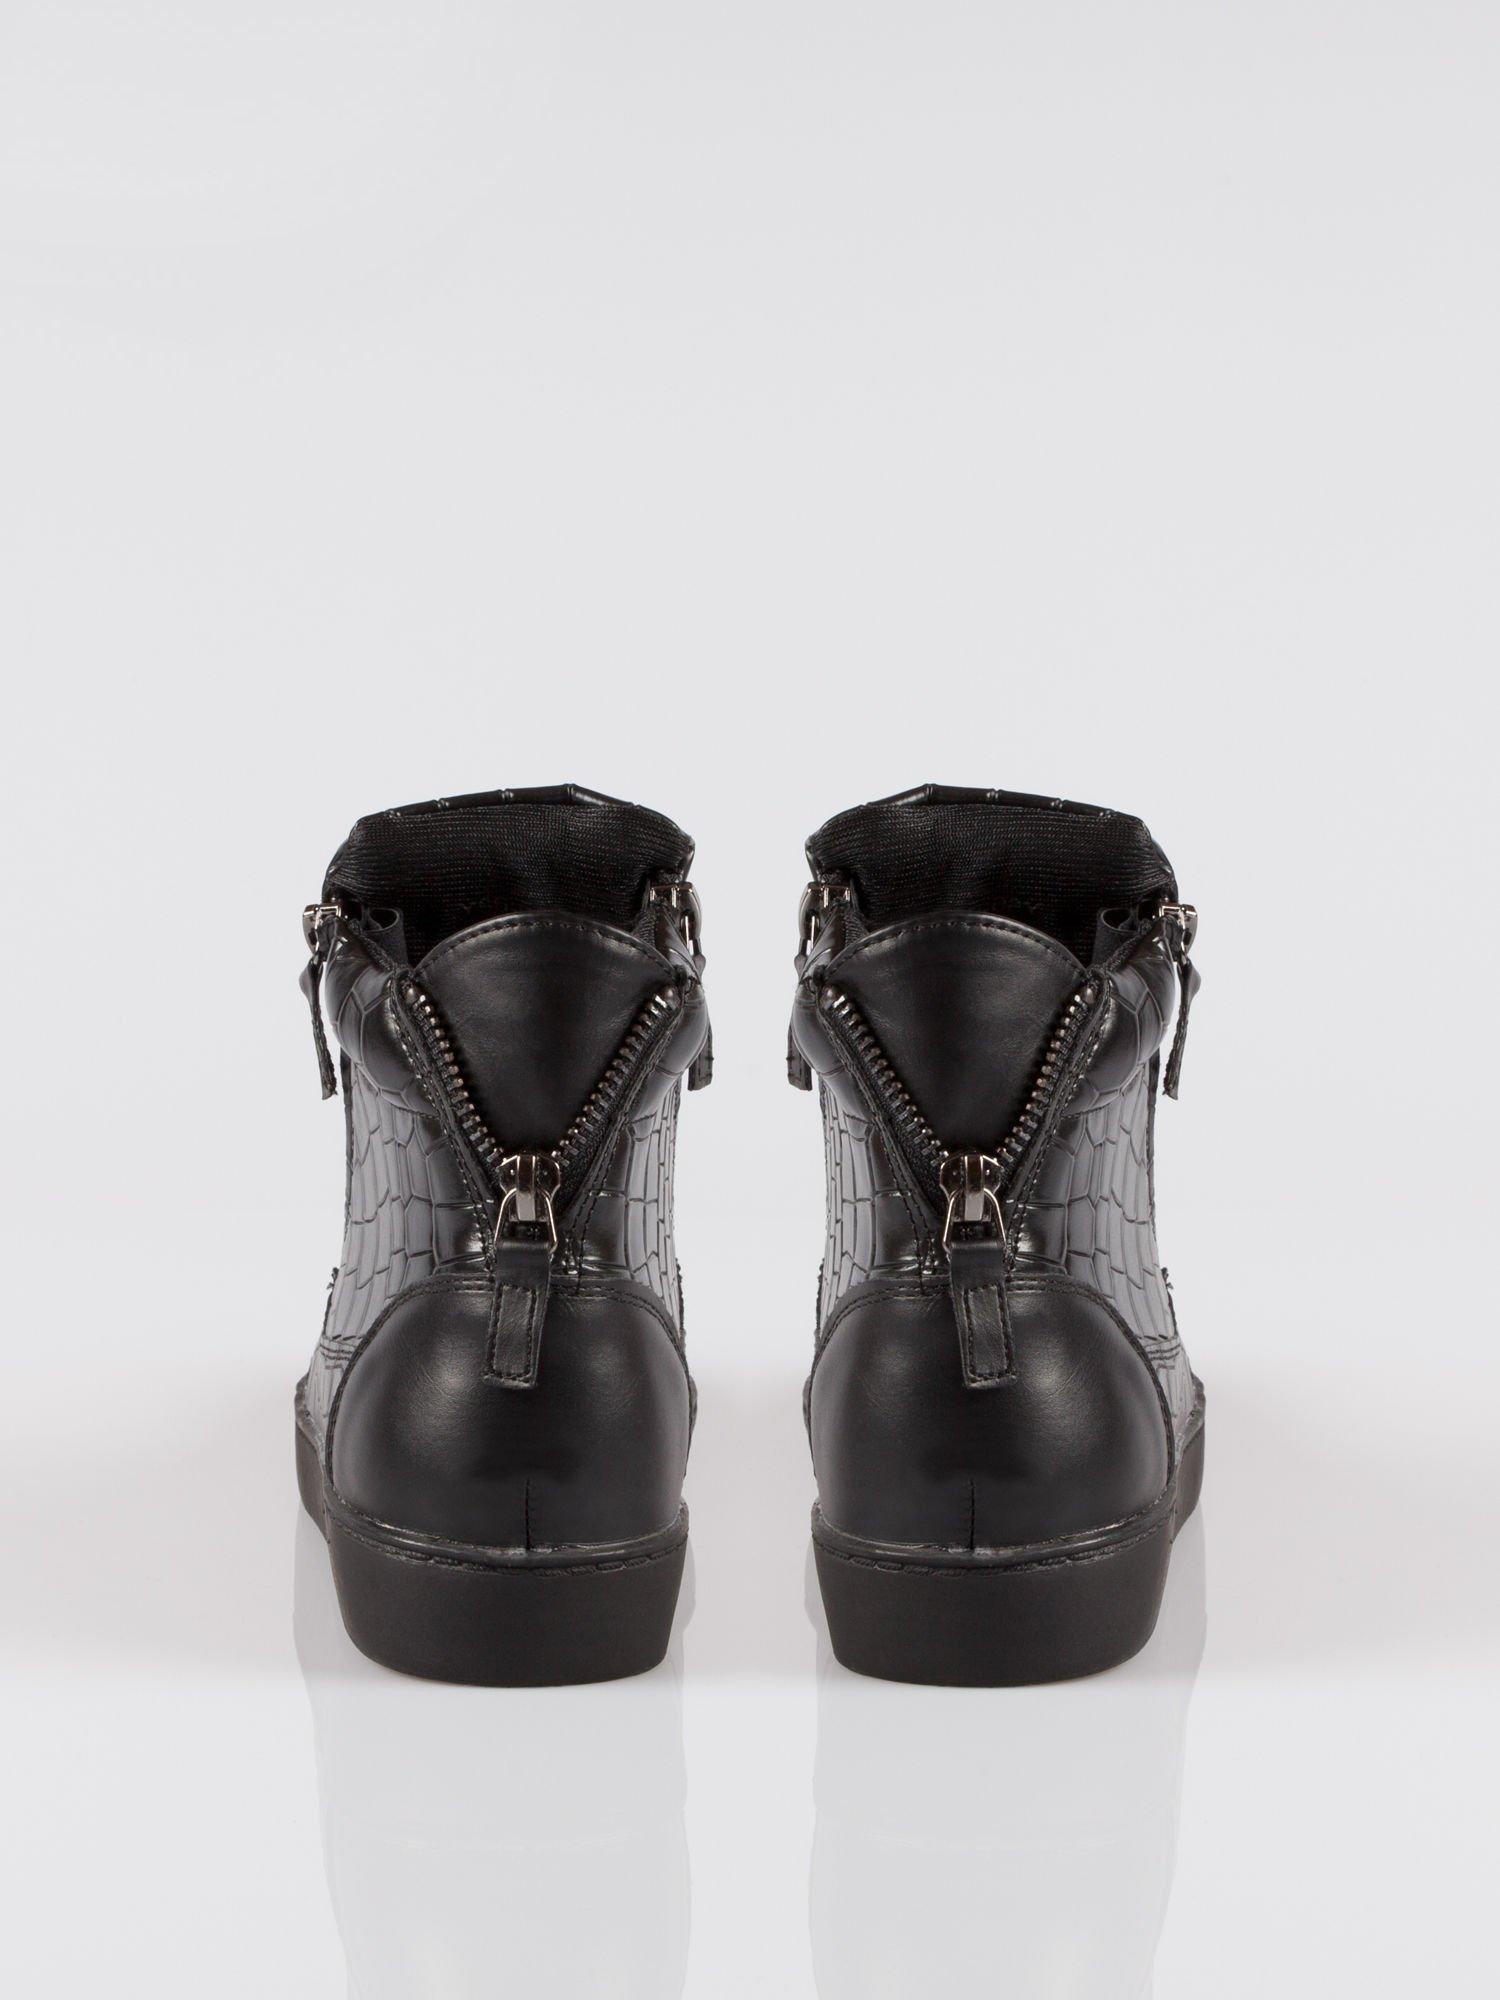 Czarne sneakersy Vanessa tłoczone na wzór skóry krokodyla                                  zdj.                                  3